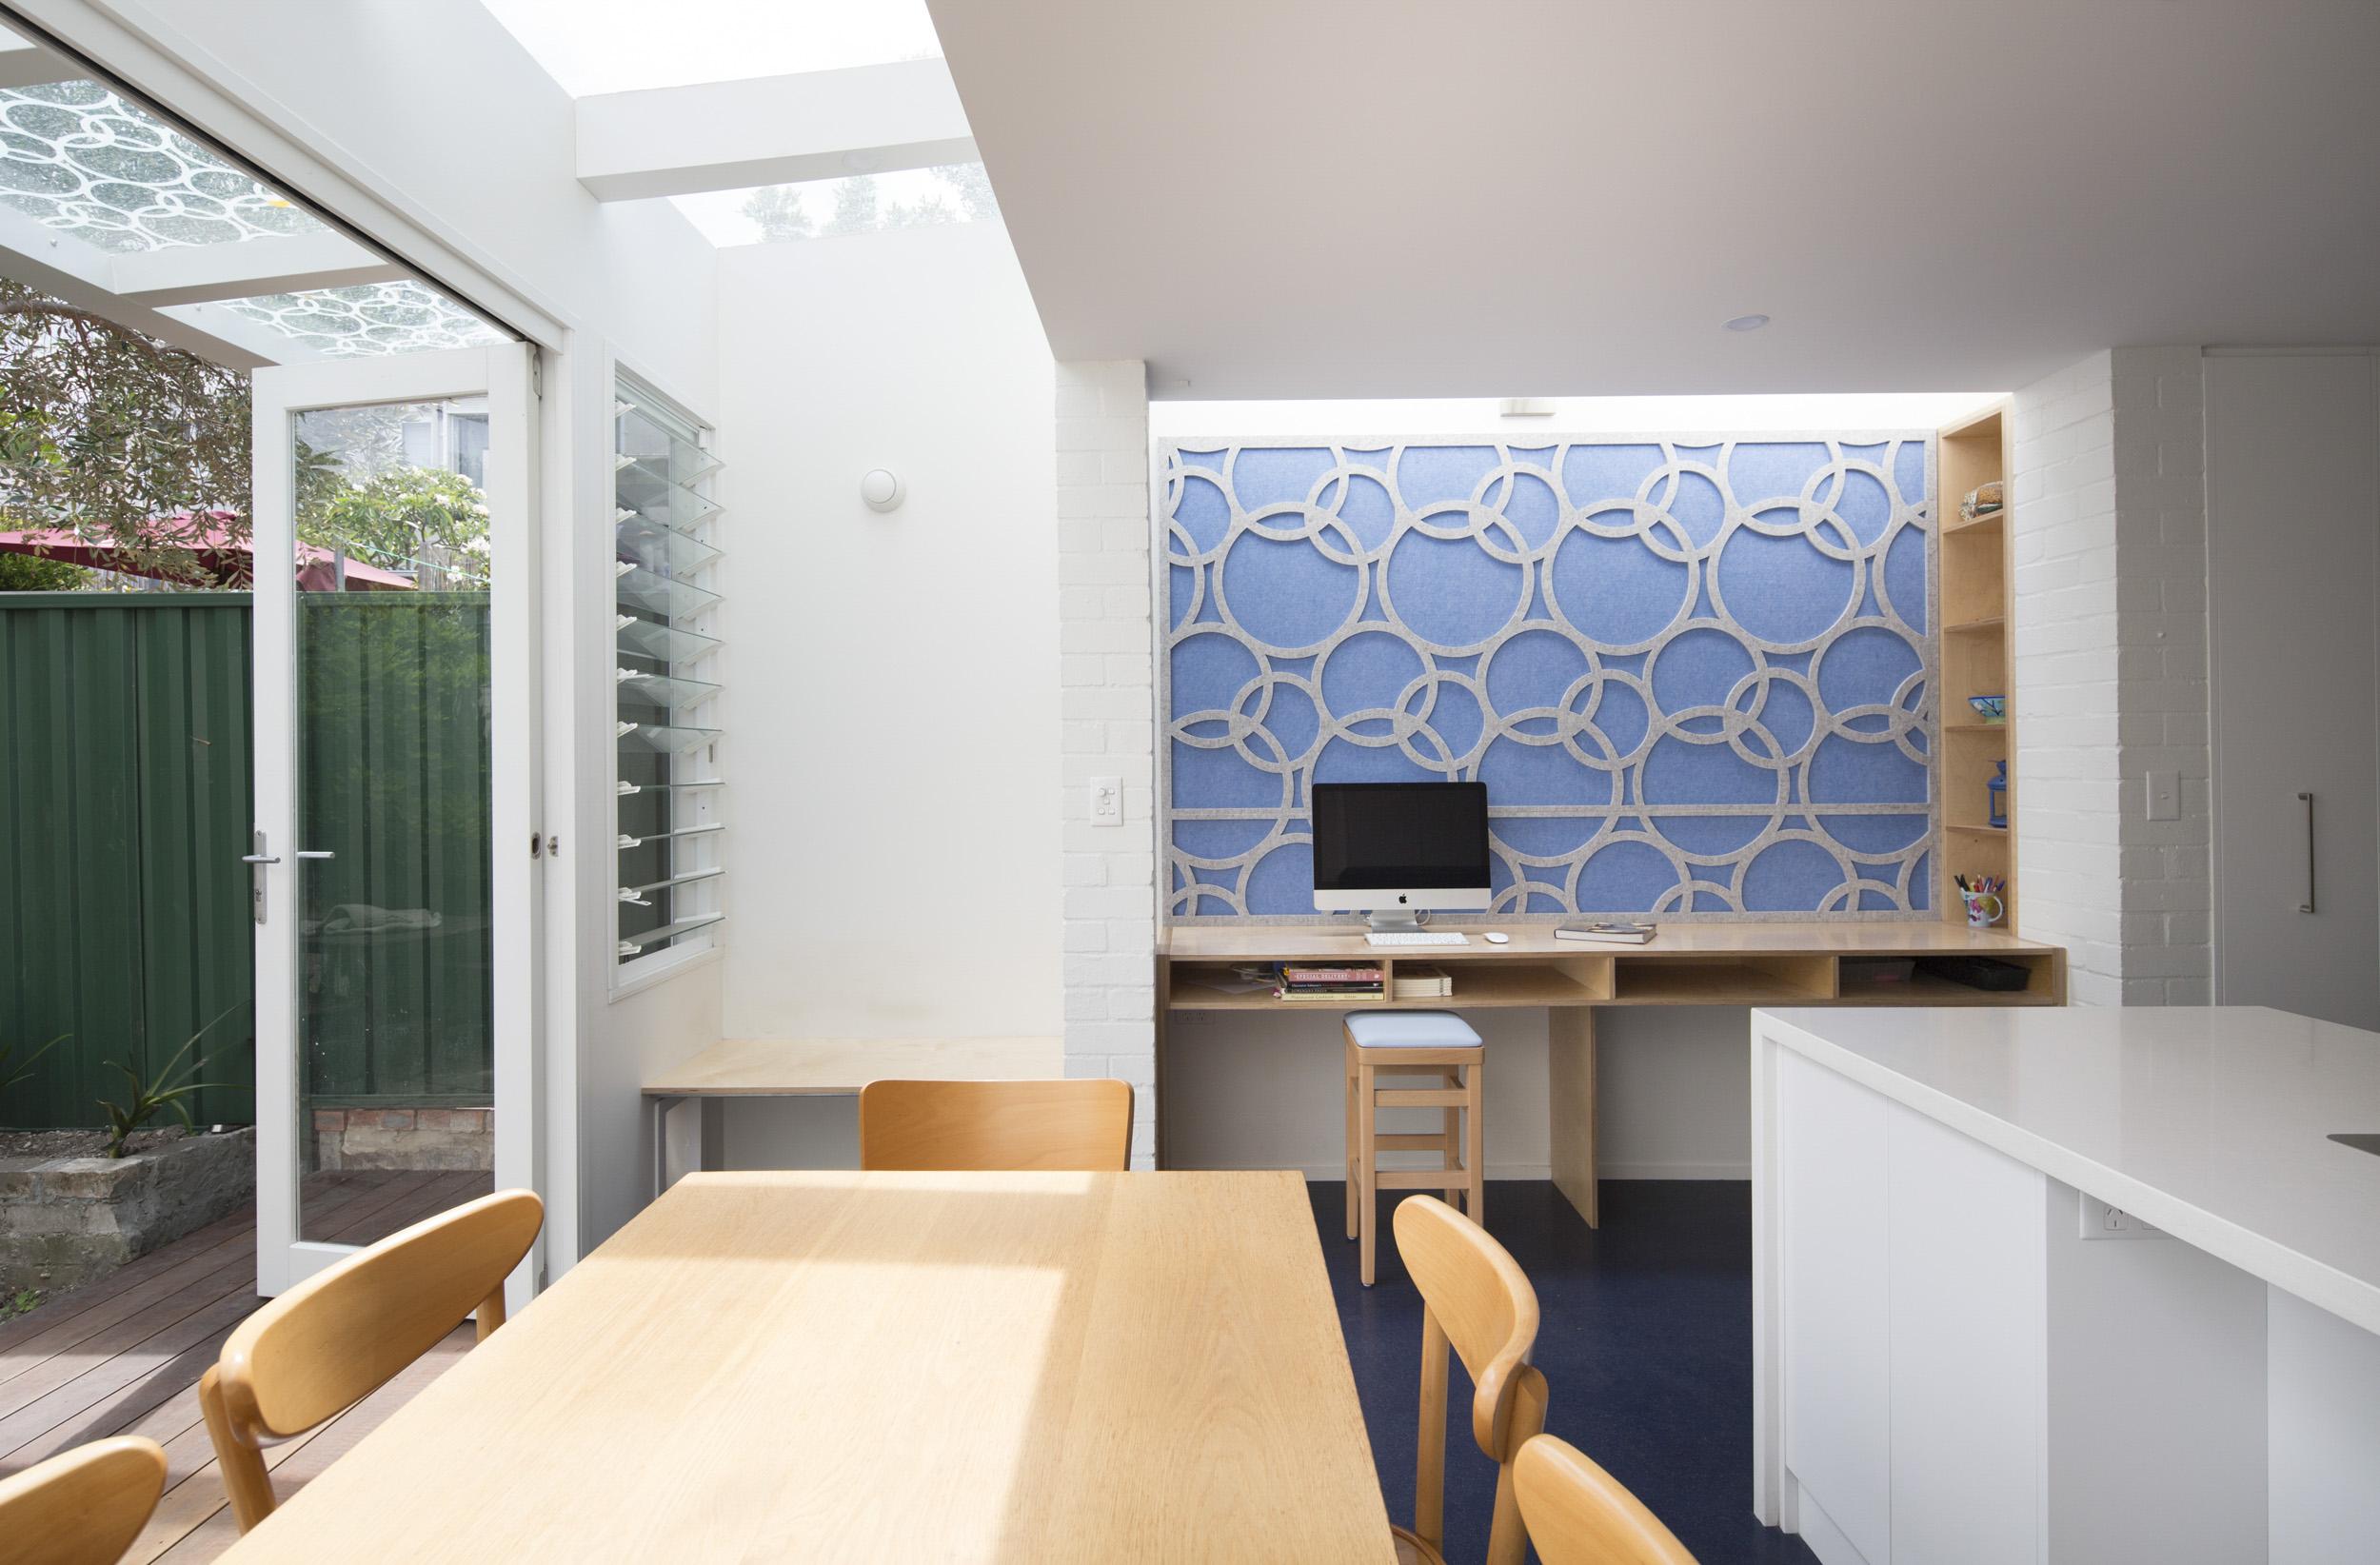 residential_architecture_sydney_australia_04.jpg